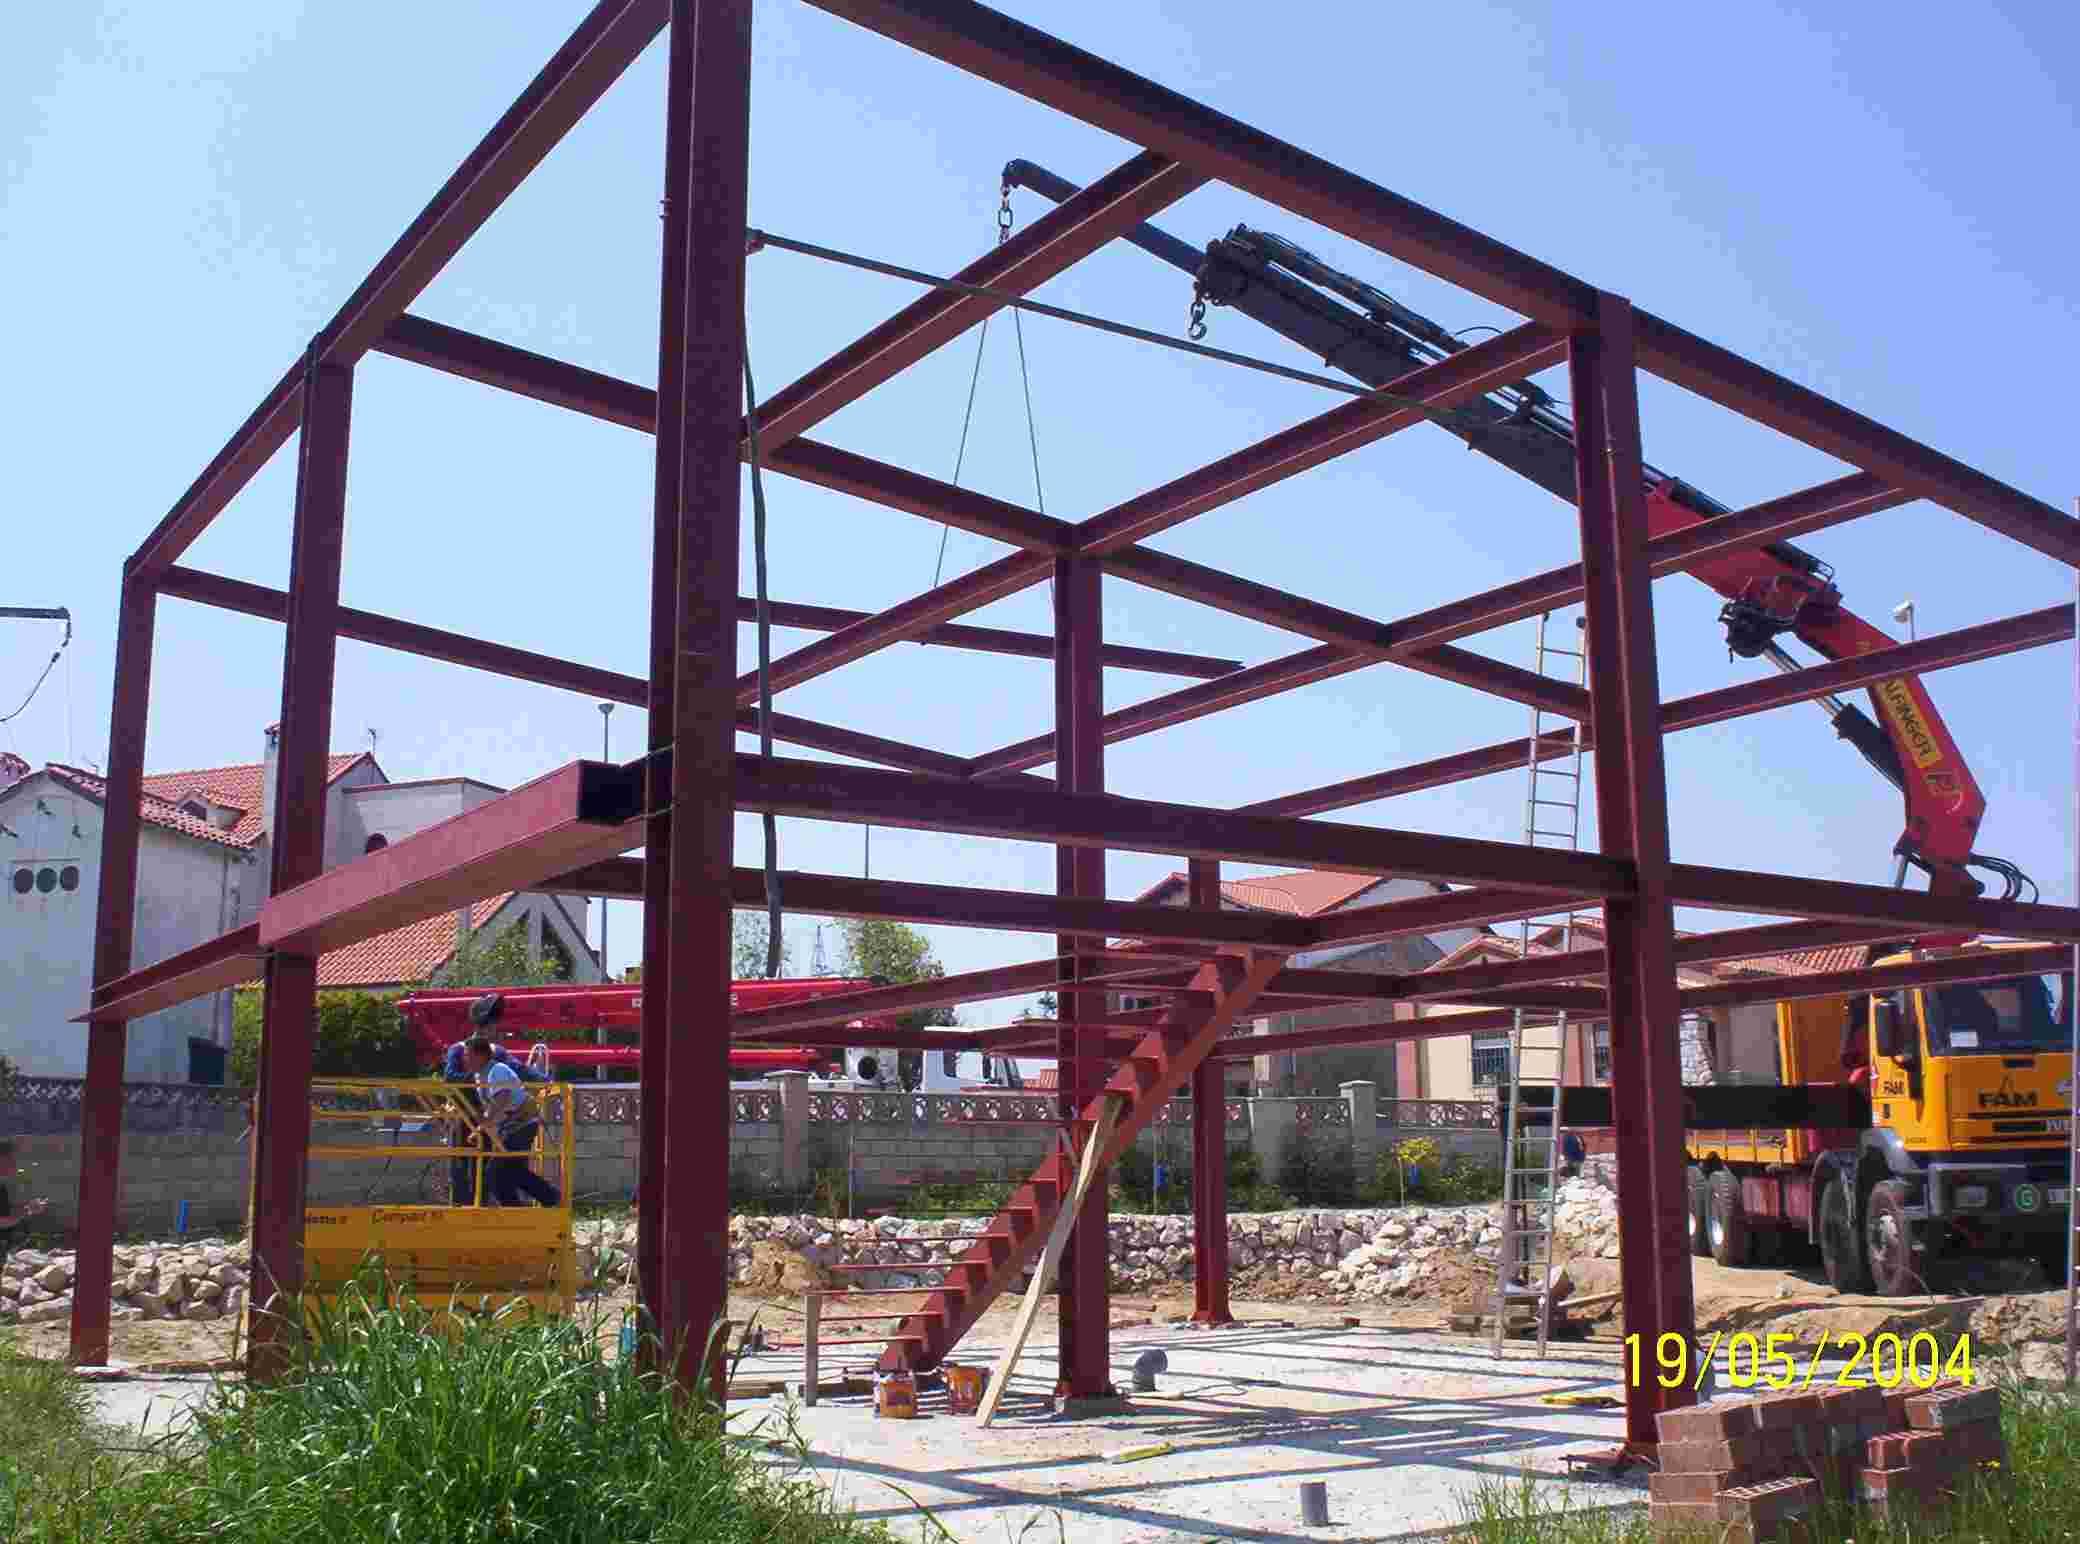 Casas Estructura Metalica - Ideas De Disenos - Ciboney.net